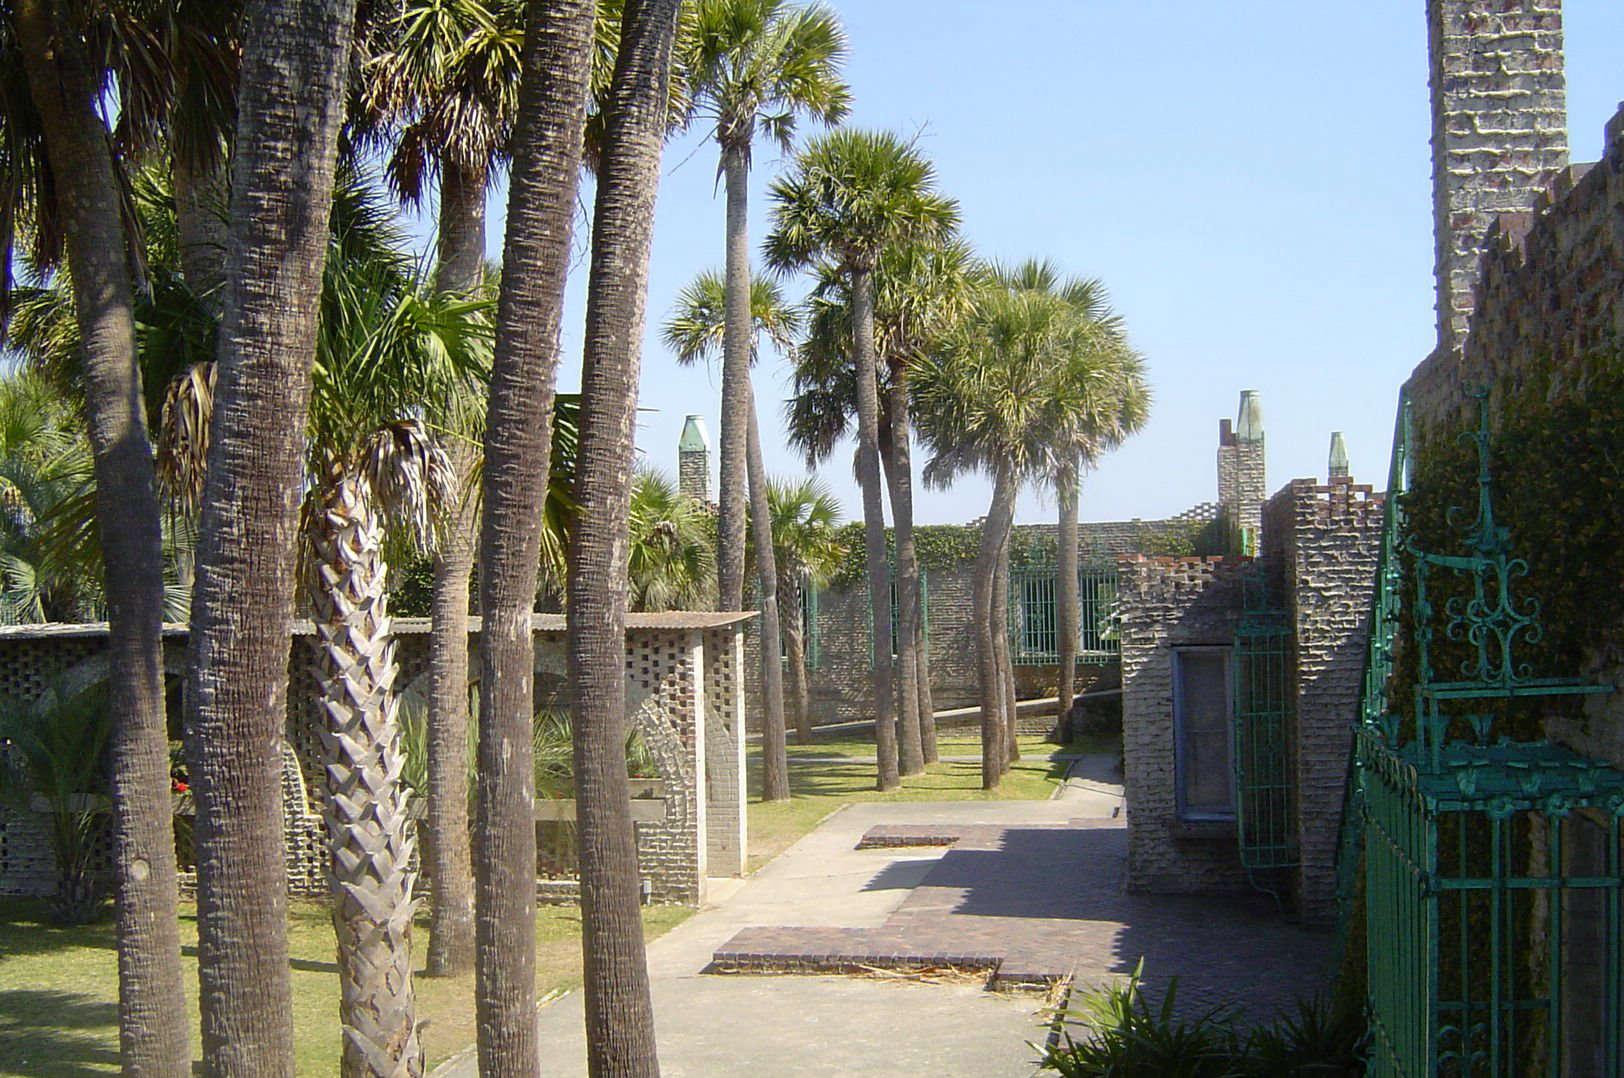 atalaya-castle-palm-trees-courtyard-doug-coldwell-wikimedia